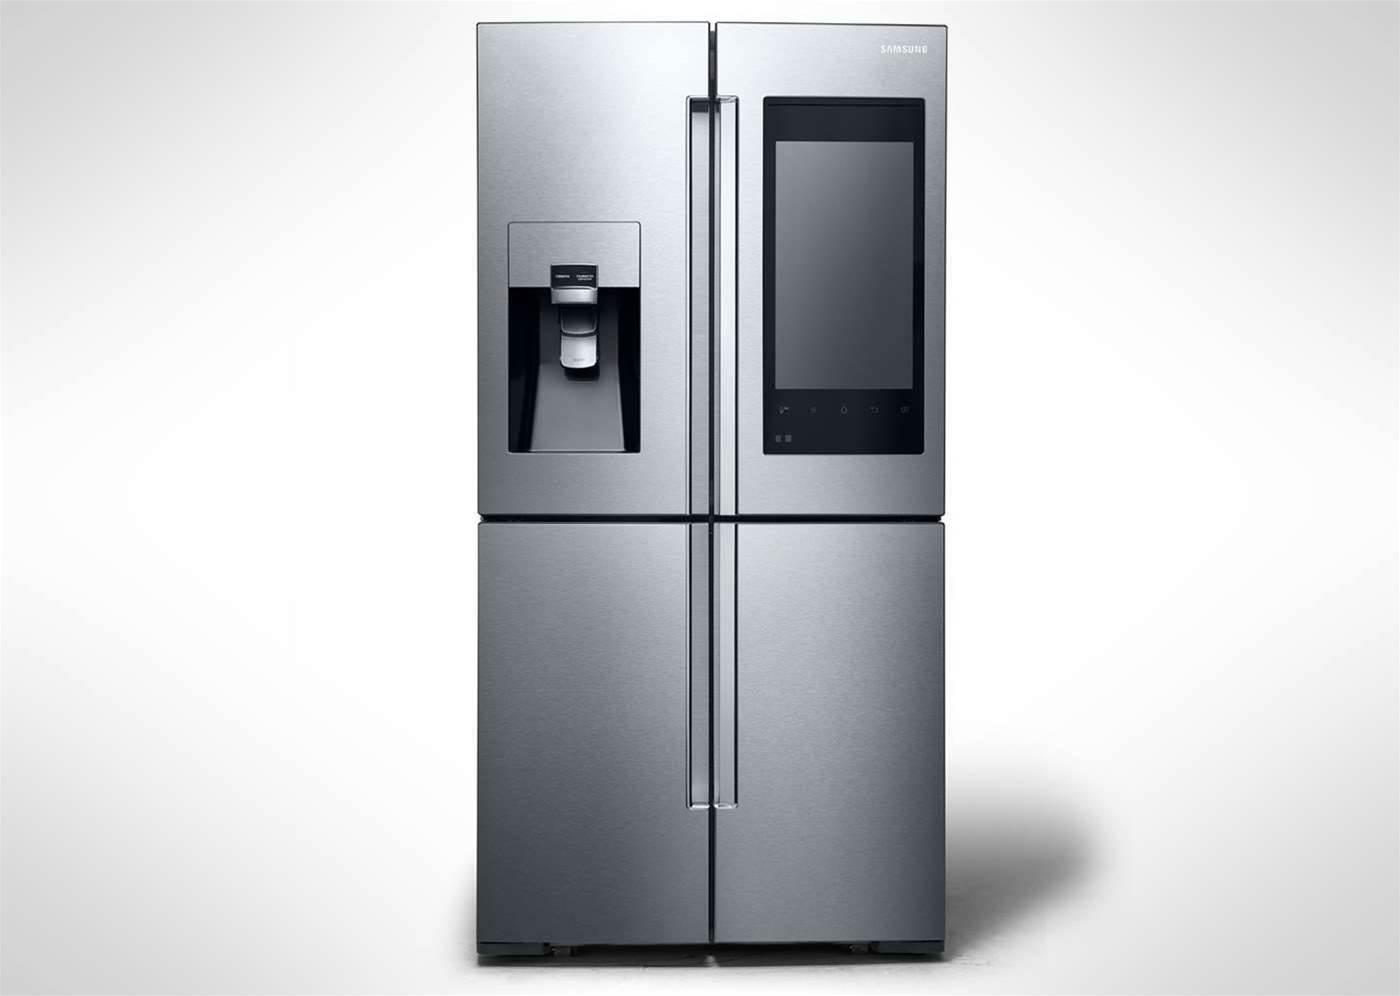 Samsung, Whirlpool bank on smart fridge renaissance